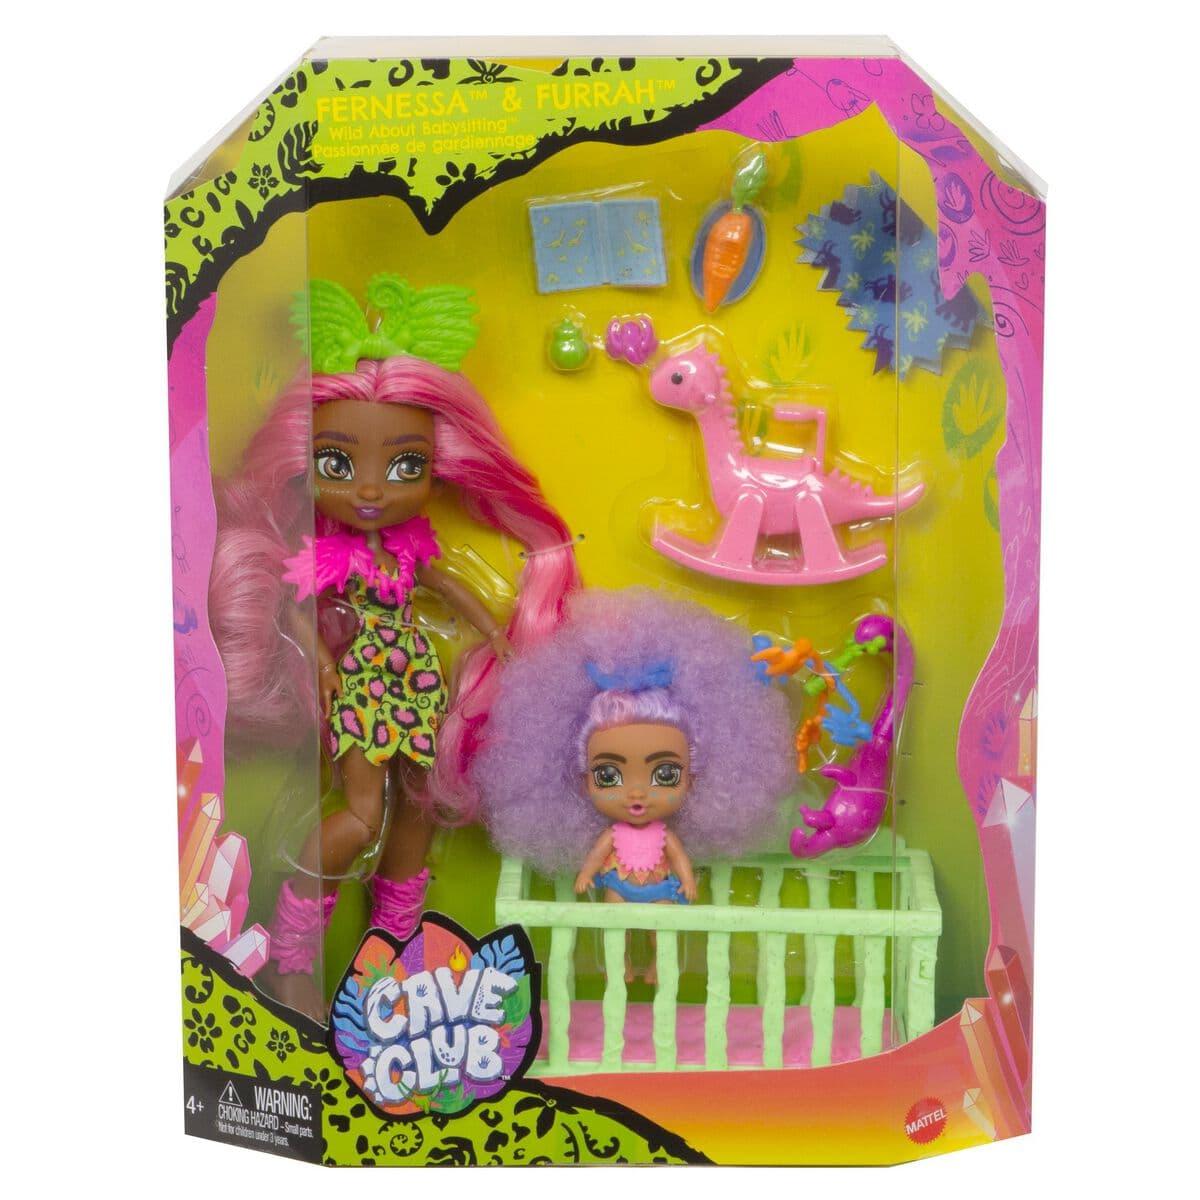 Mattel Cave Club GNL92 Puppen-Spielset Puppenset